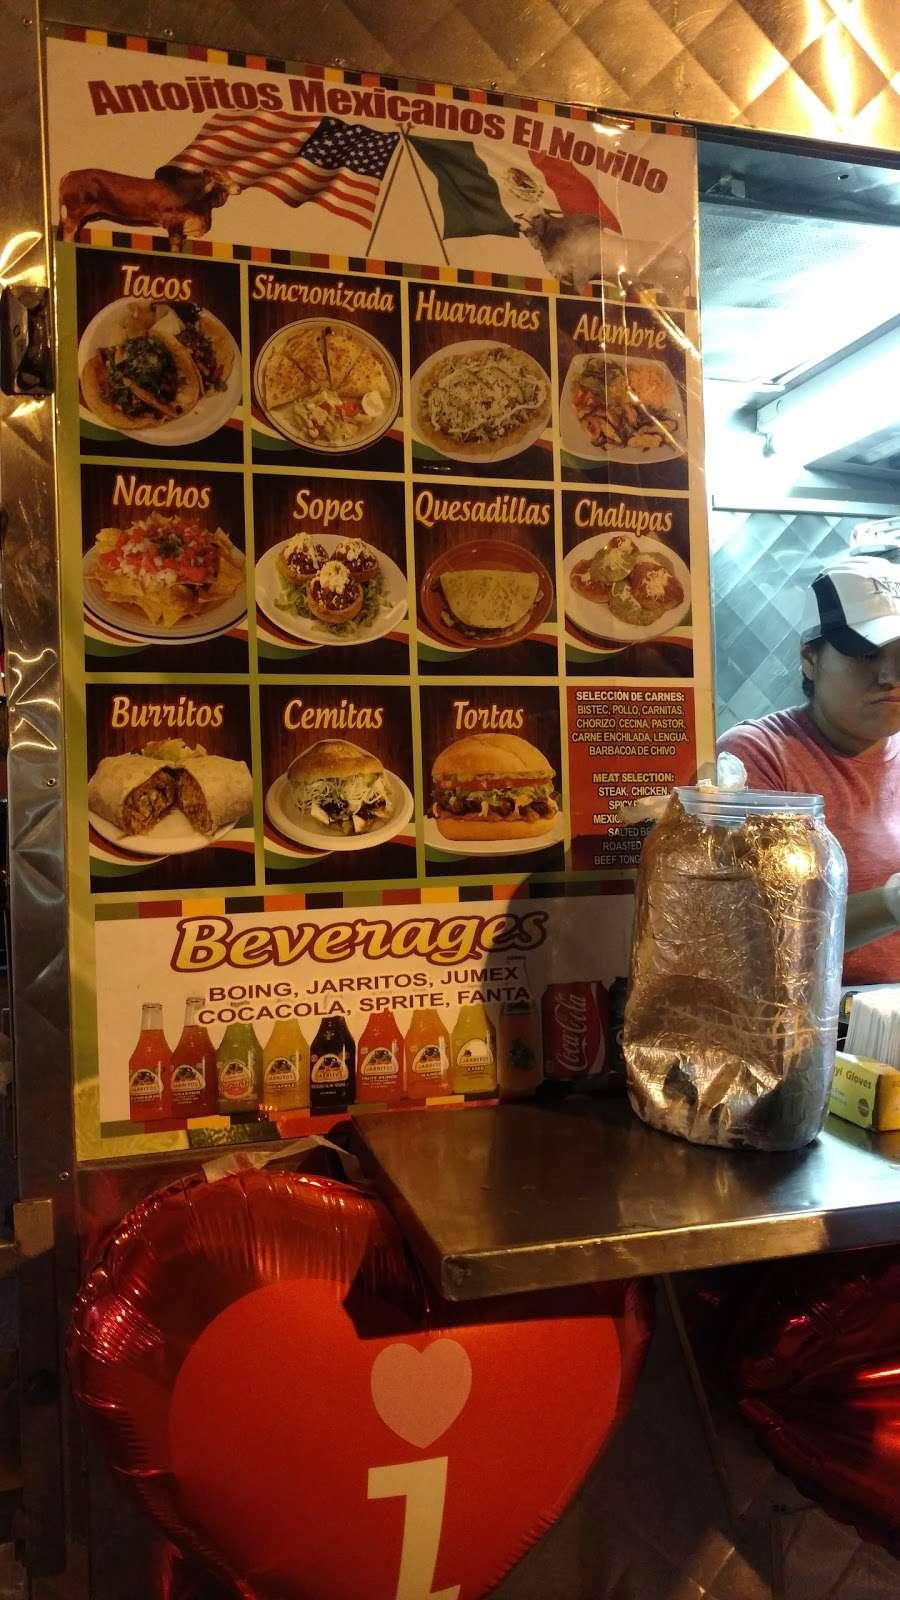 El Novillo - Antojitos Mexicanos - restaurant  | Photo 5 of 8 | Address: 40-0 Prince St, Flushing, NY 11354, USA